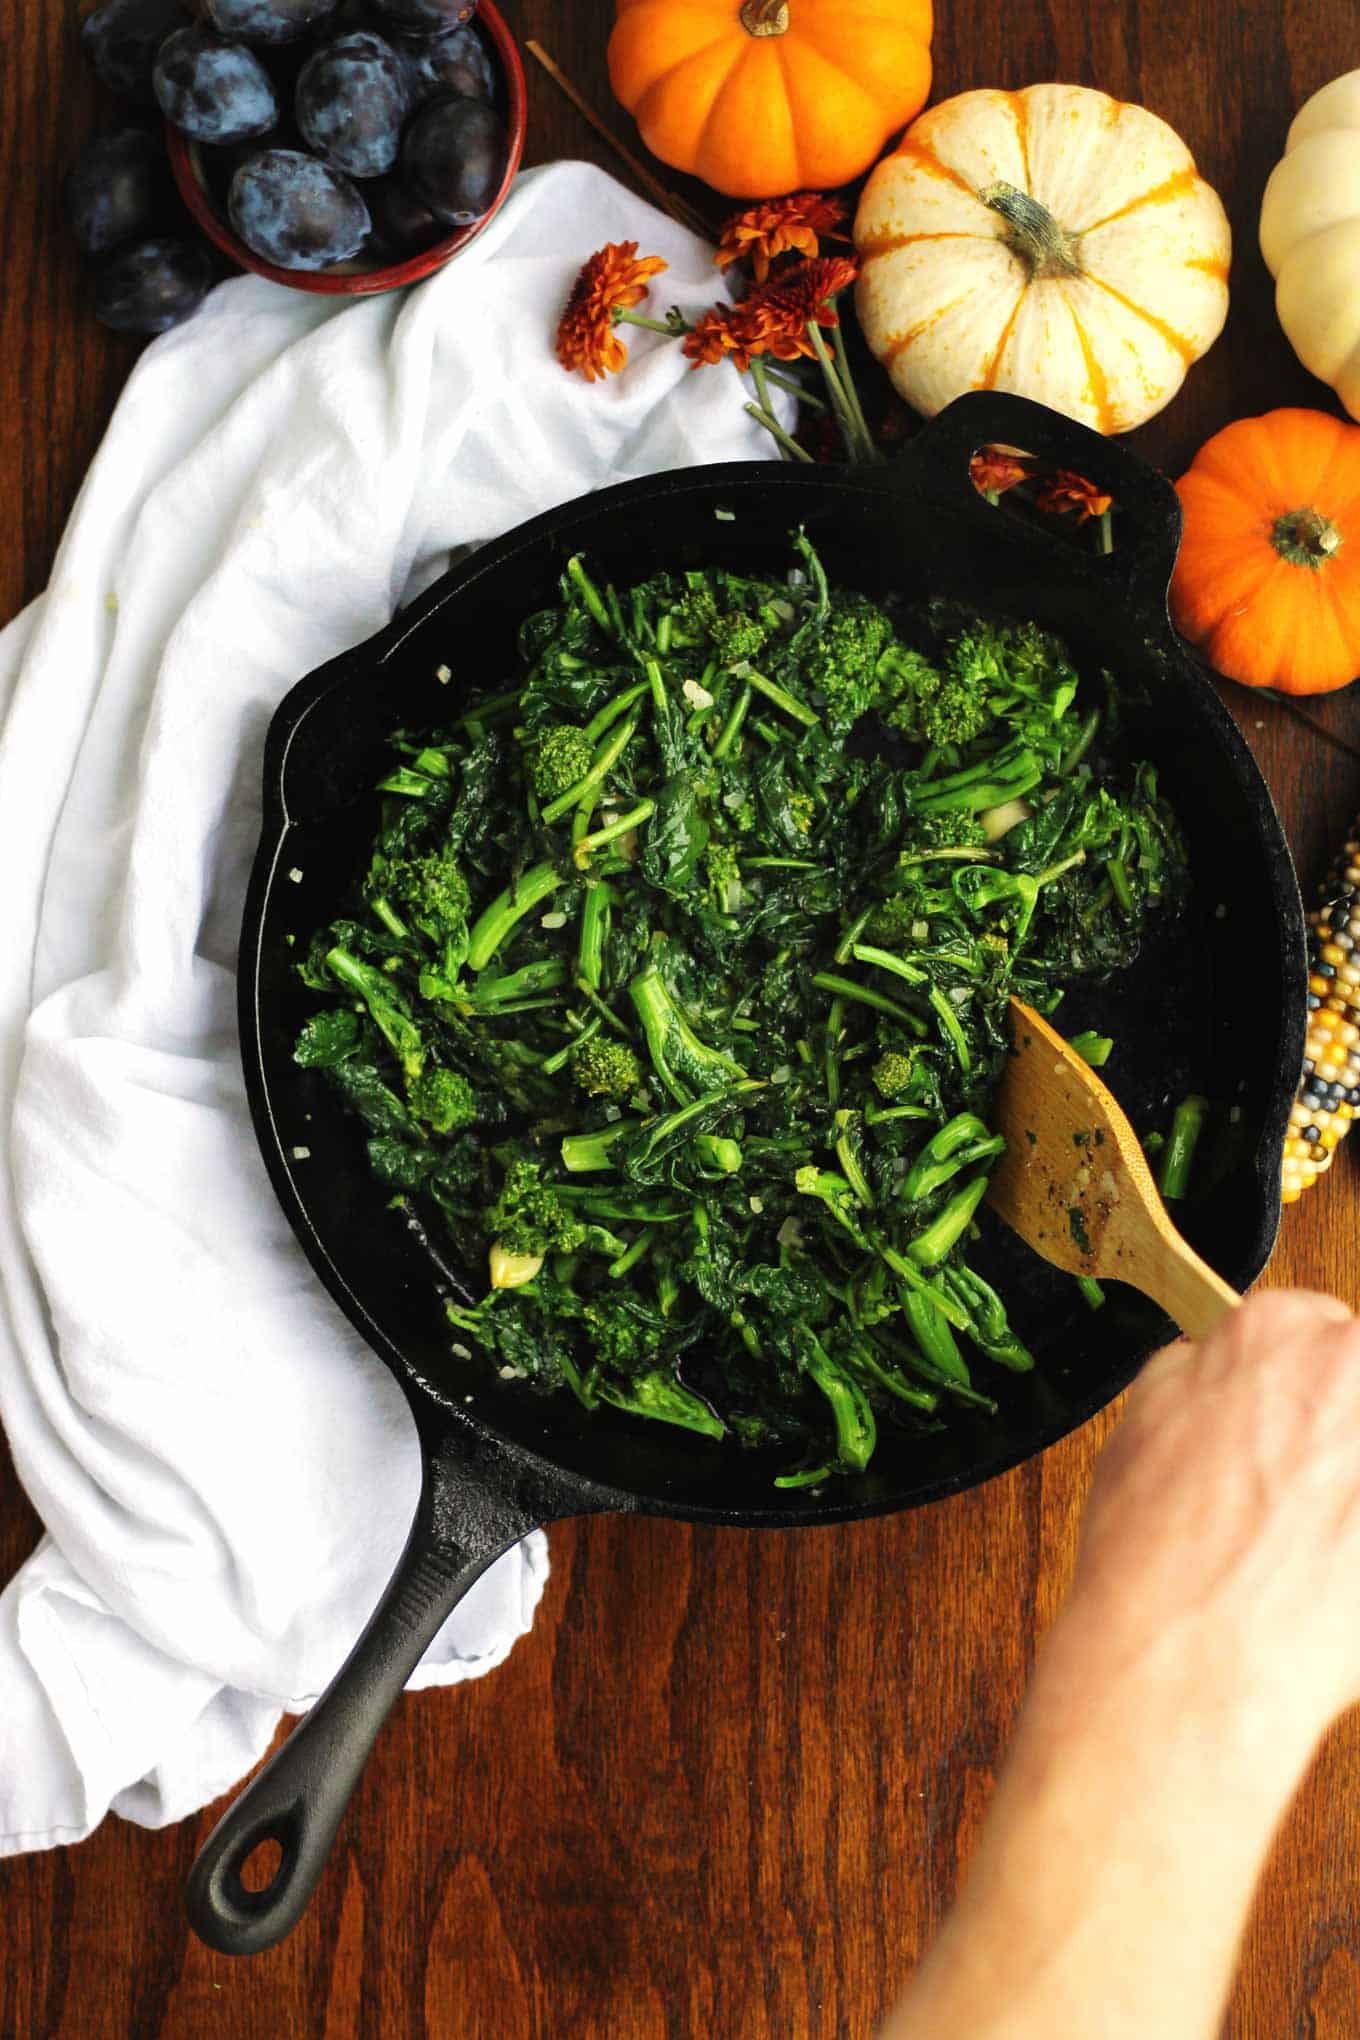 sauteed broccoli rabe and kale